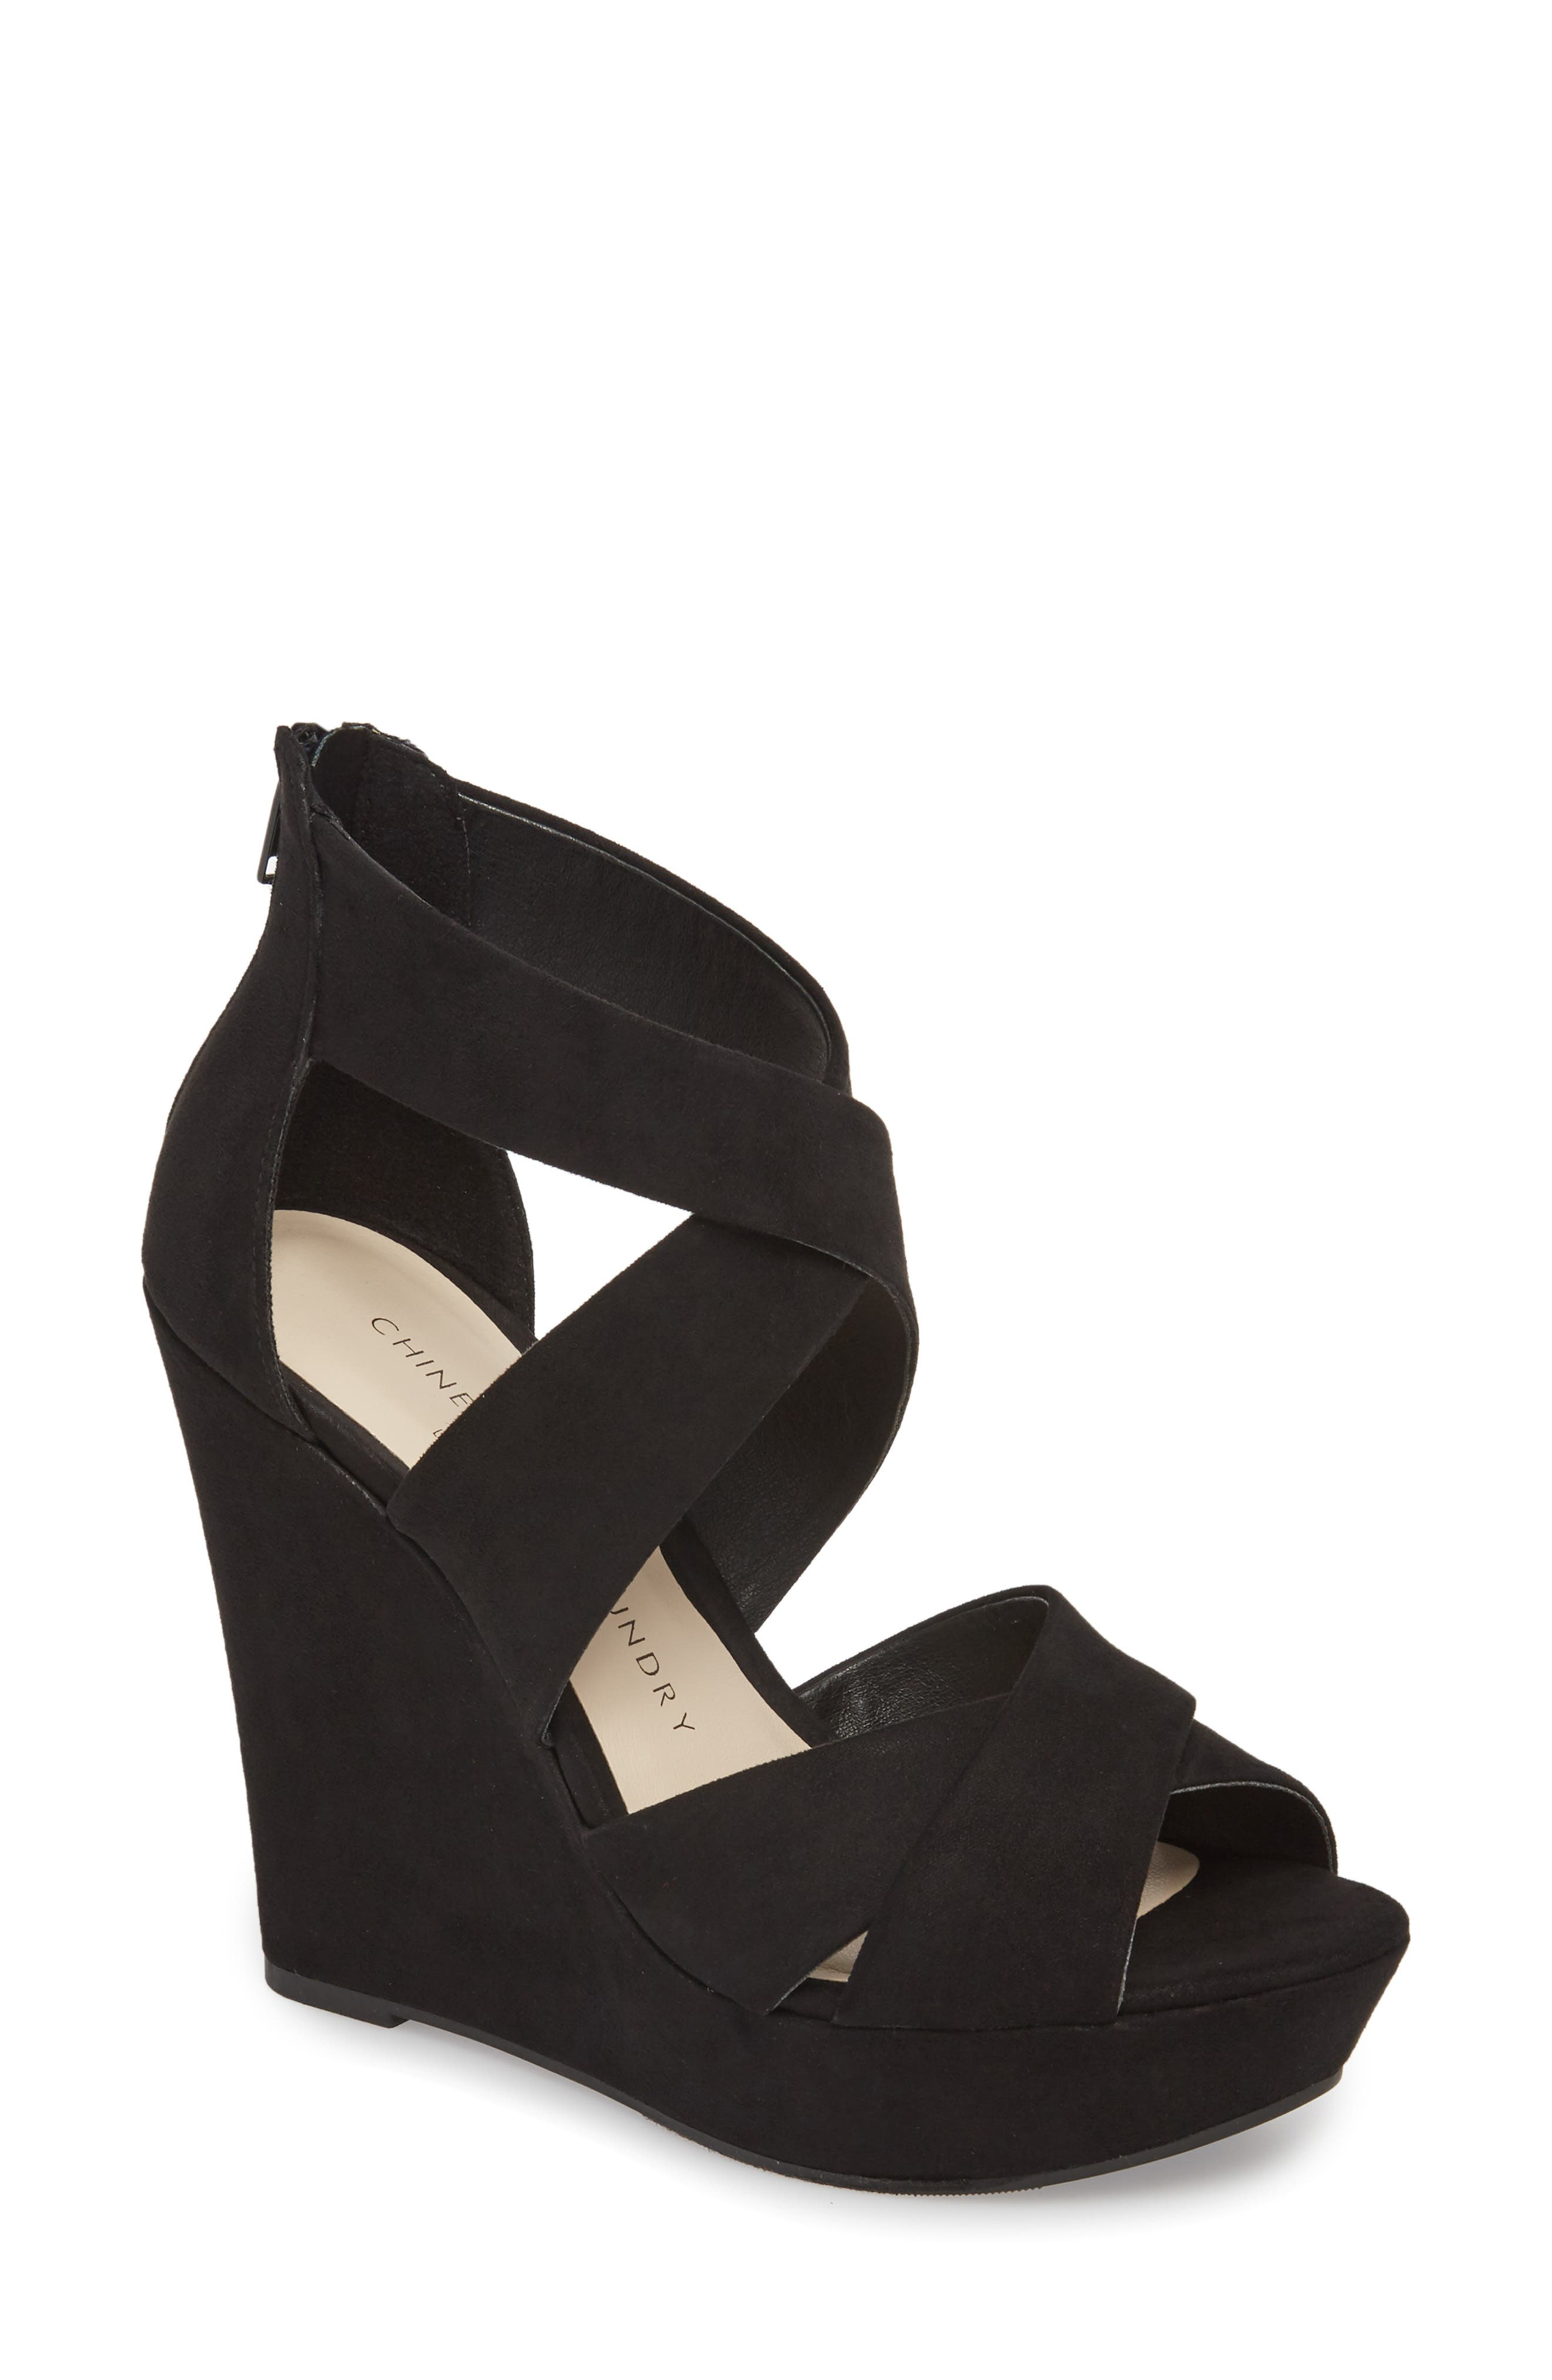 Milani Platform Wedge Sandal,                             Main thumbnail 1, color,                             BLACK